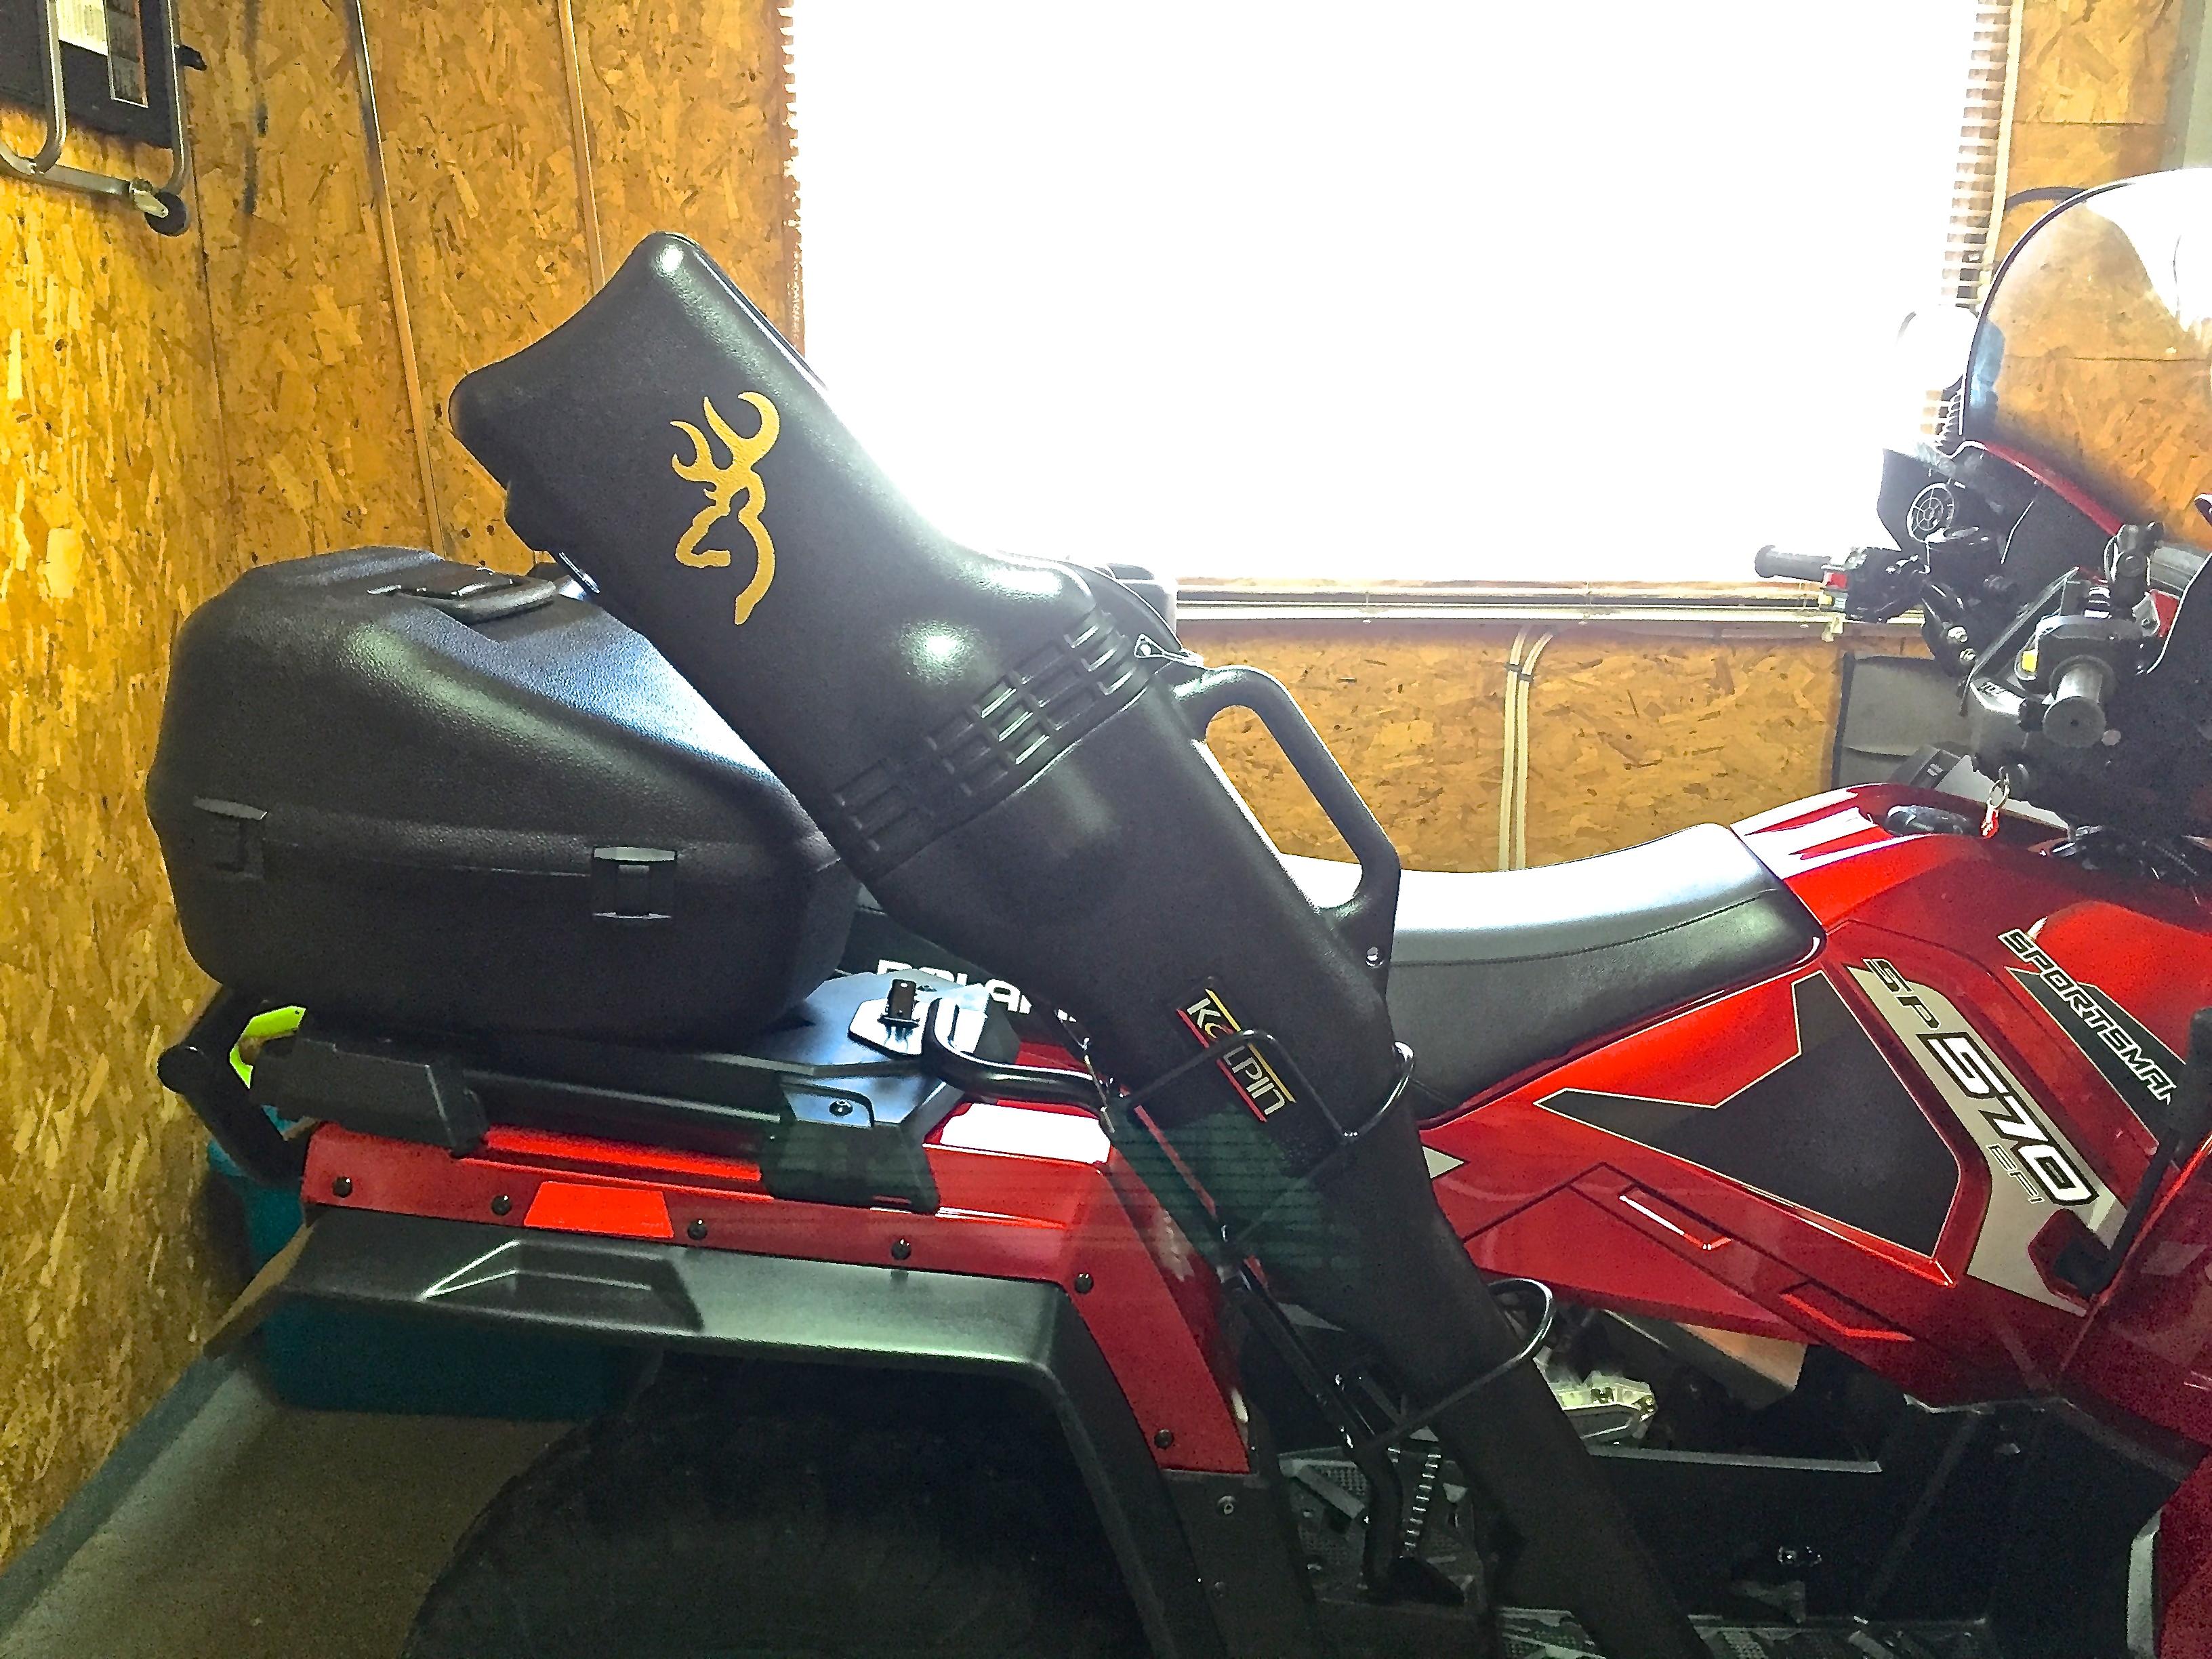 22 Inch Tires >> Gun Scabbard mounts? Not Polaris accessories? - Page 2 - Polaris ATV Forum